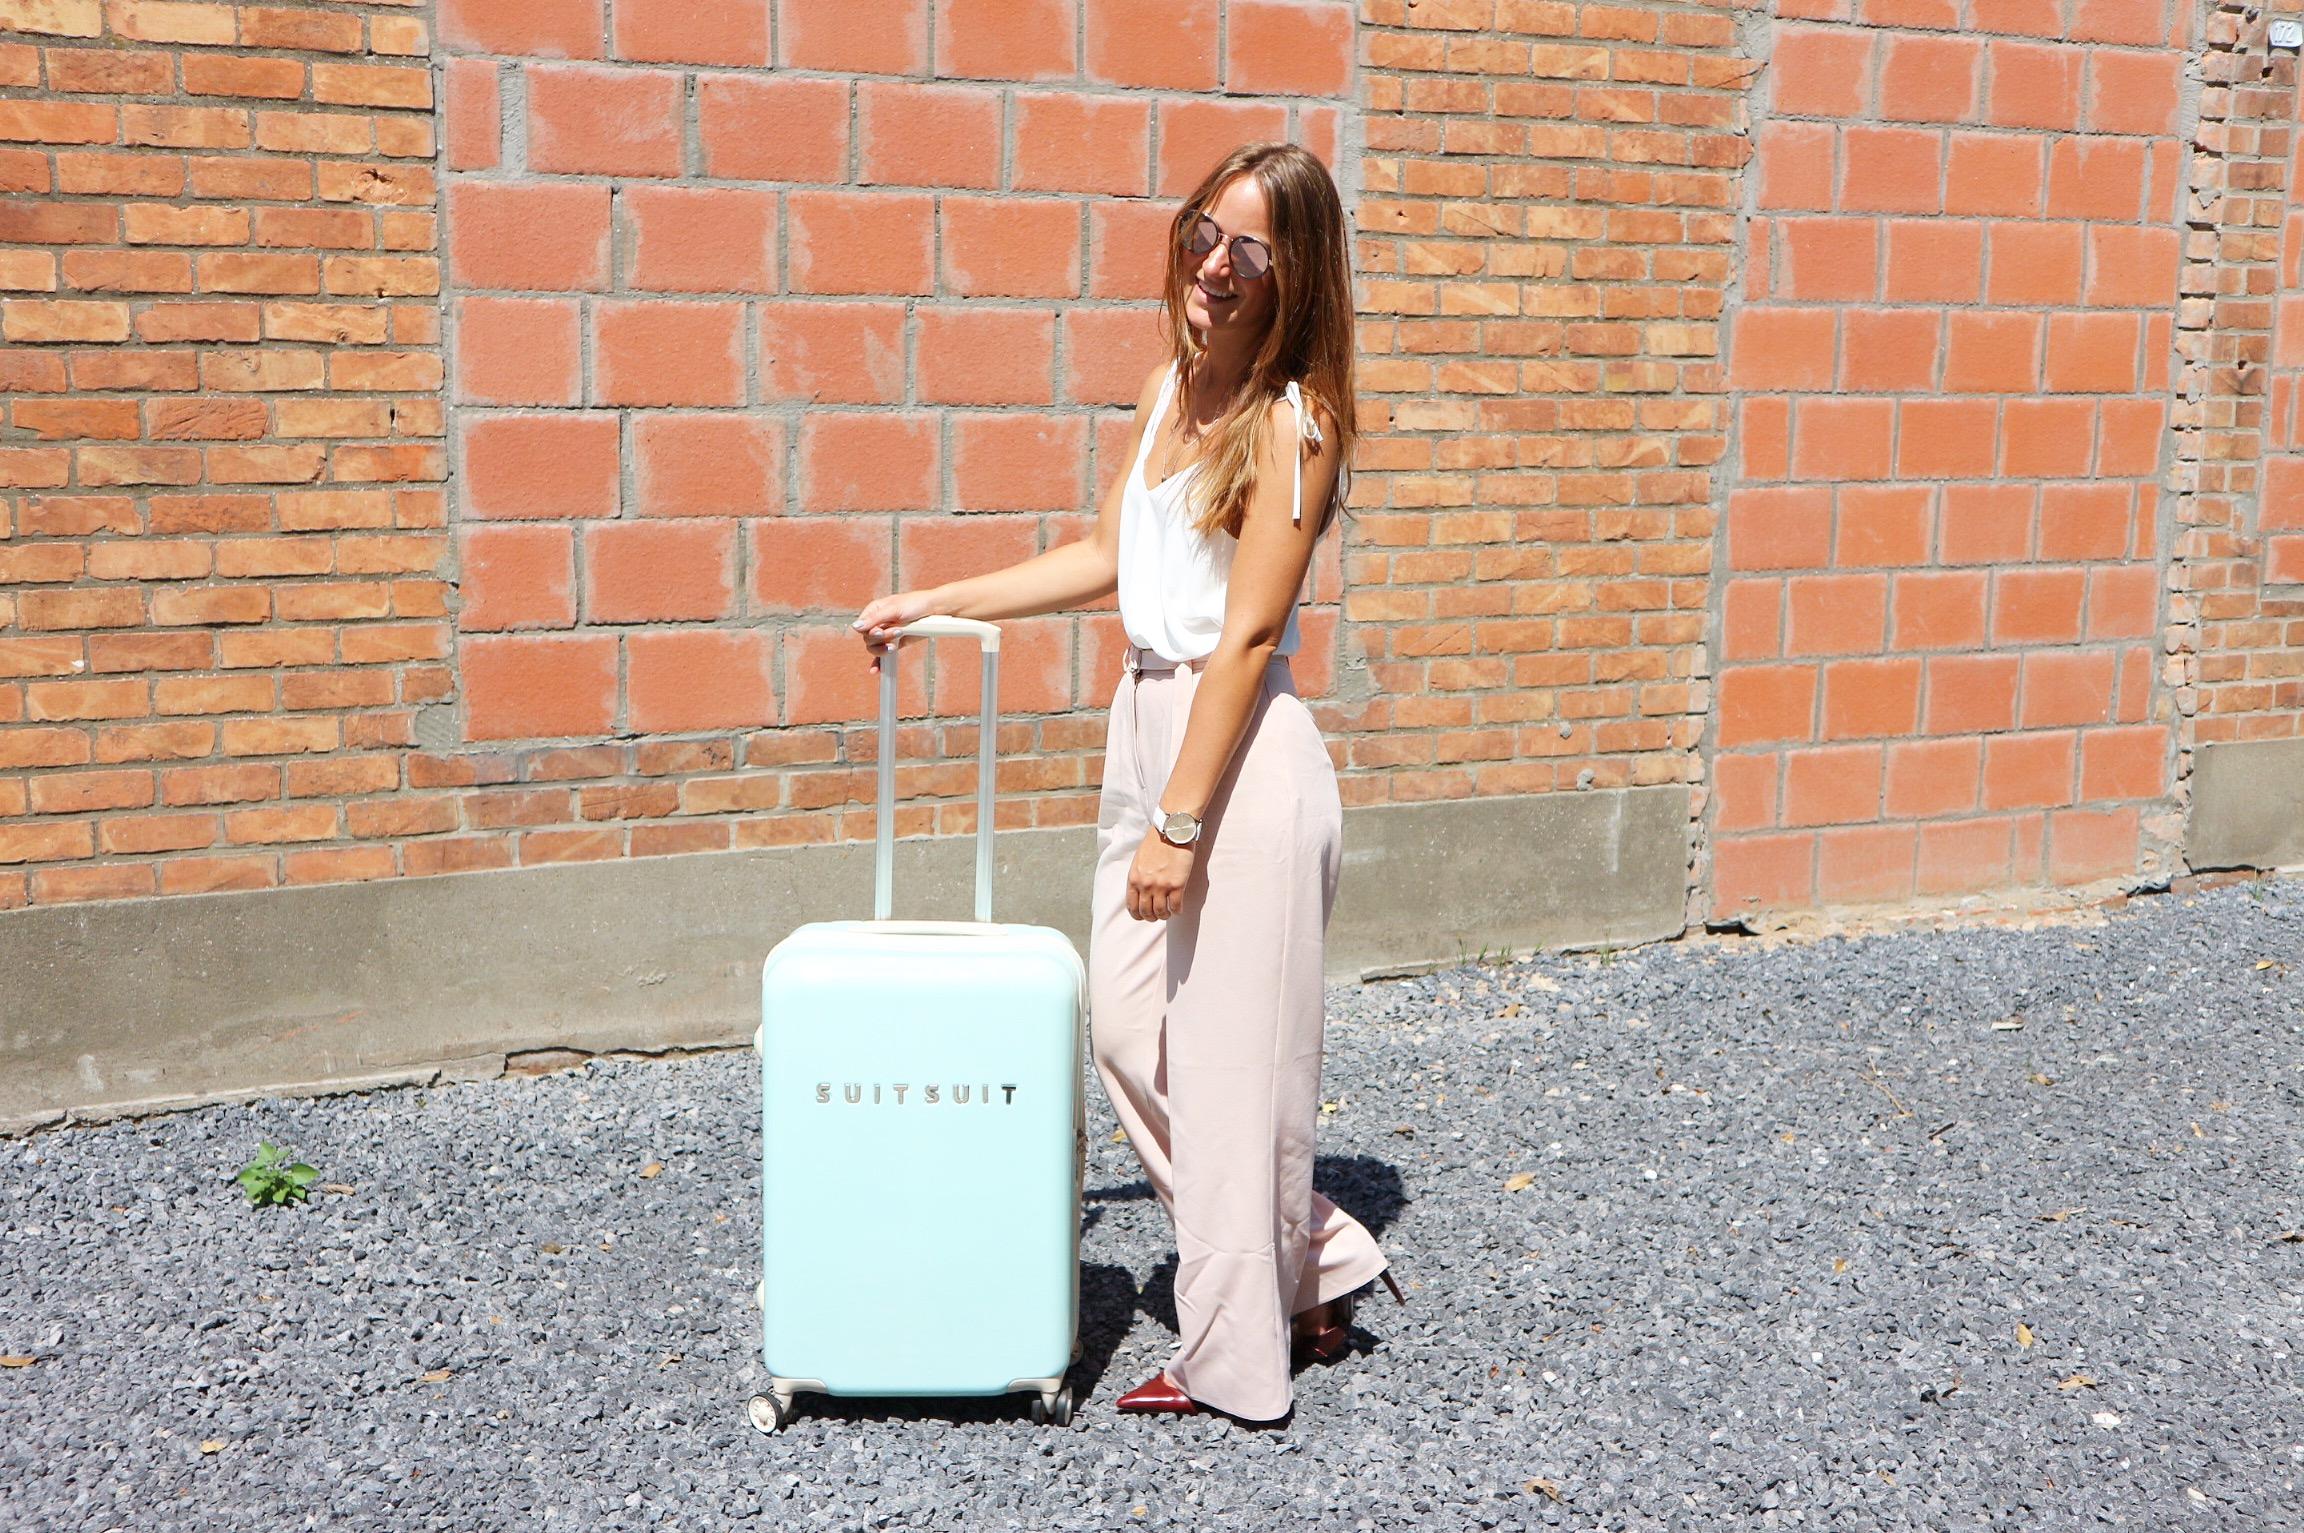 Brugge, weekendje weg, weekend, België, duifhuizen, suitsuit, koffer, vriendinnen, vakantie, plezier, lachen, zomer, ijs, wafels, eten